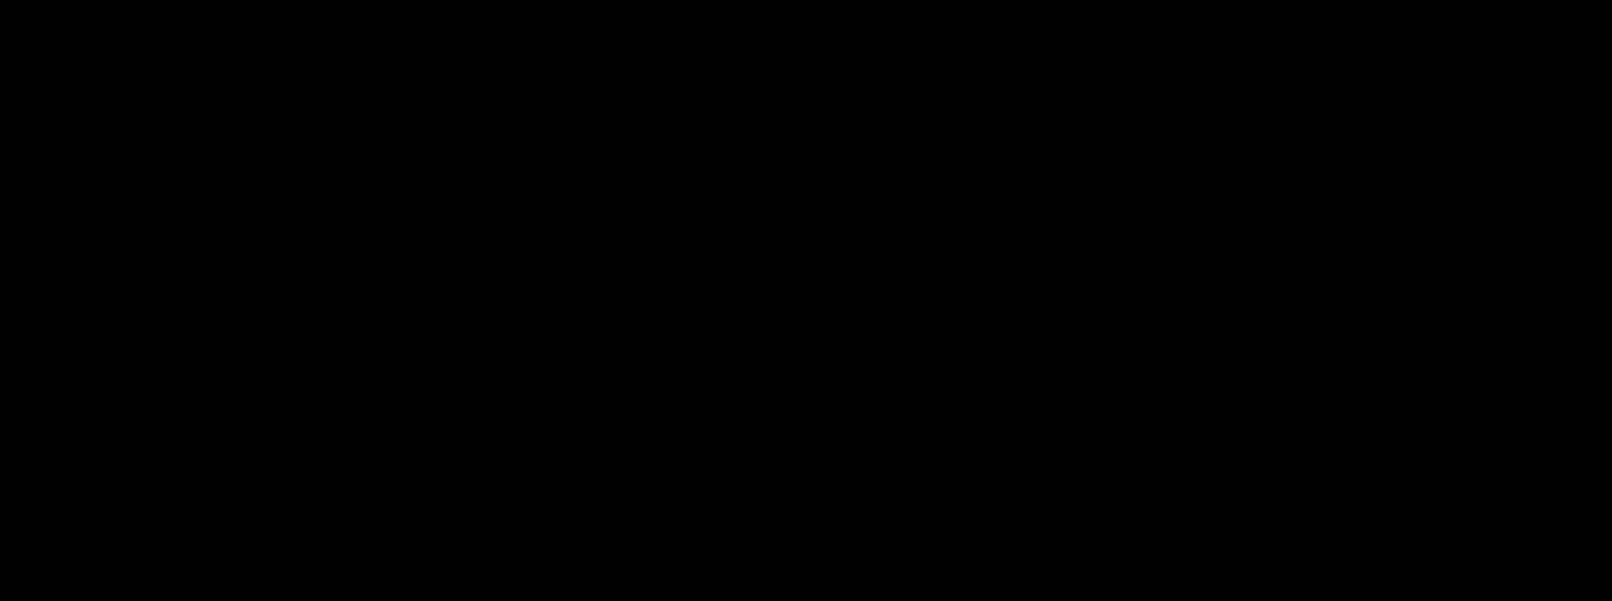 6-Amino-4-((3-chloro-4-(pyridin-2-ylmethoxy)phenyl)amino)-7-ethoxyquinoline-3-carbonitrile